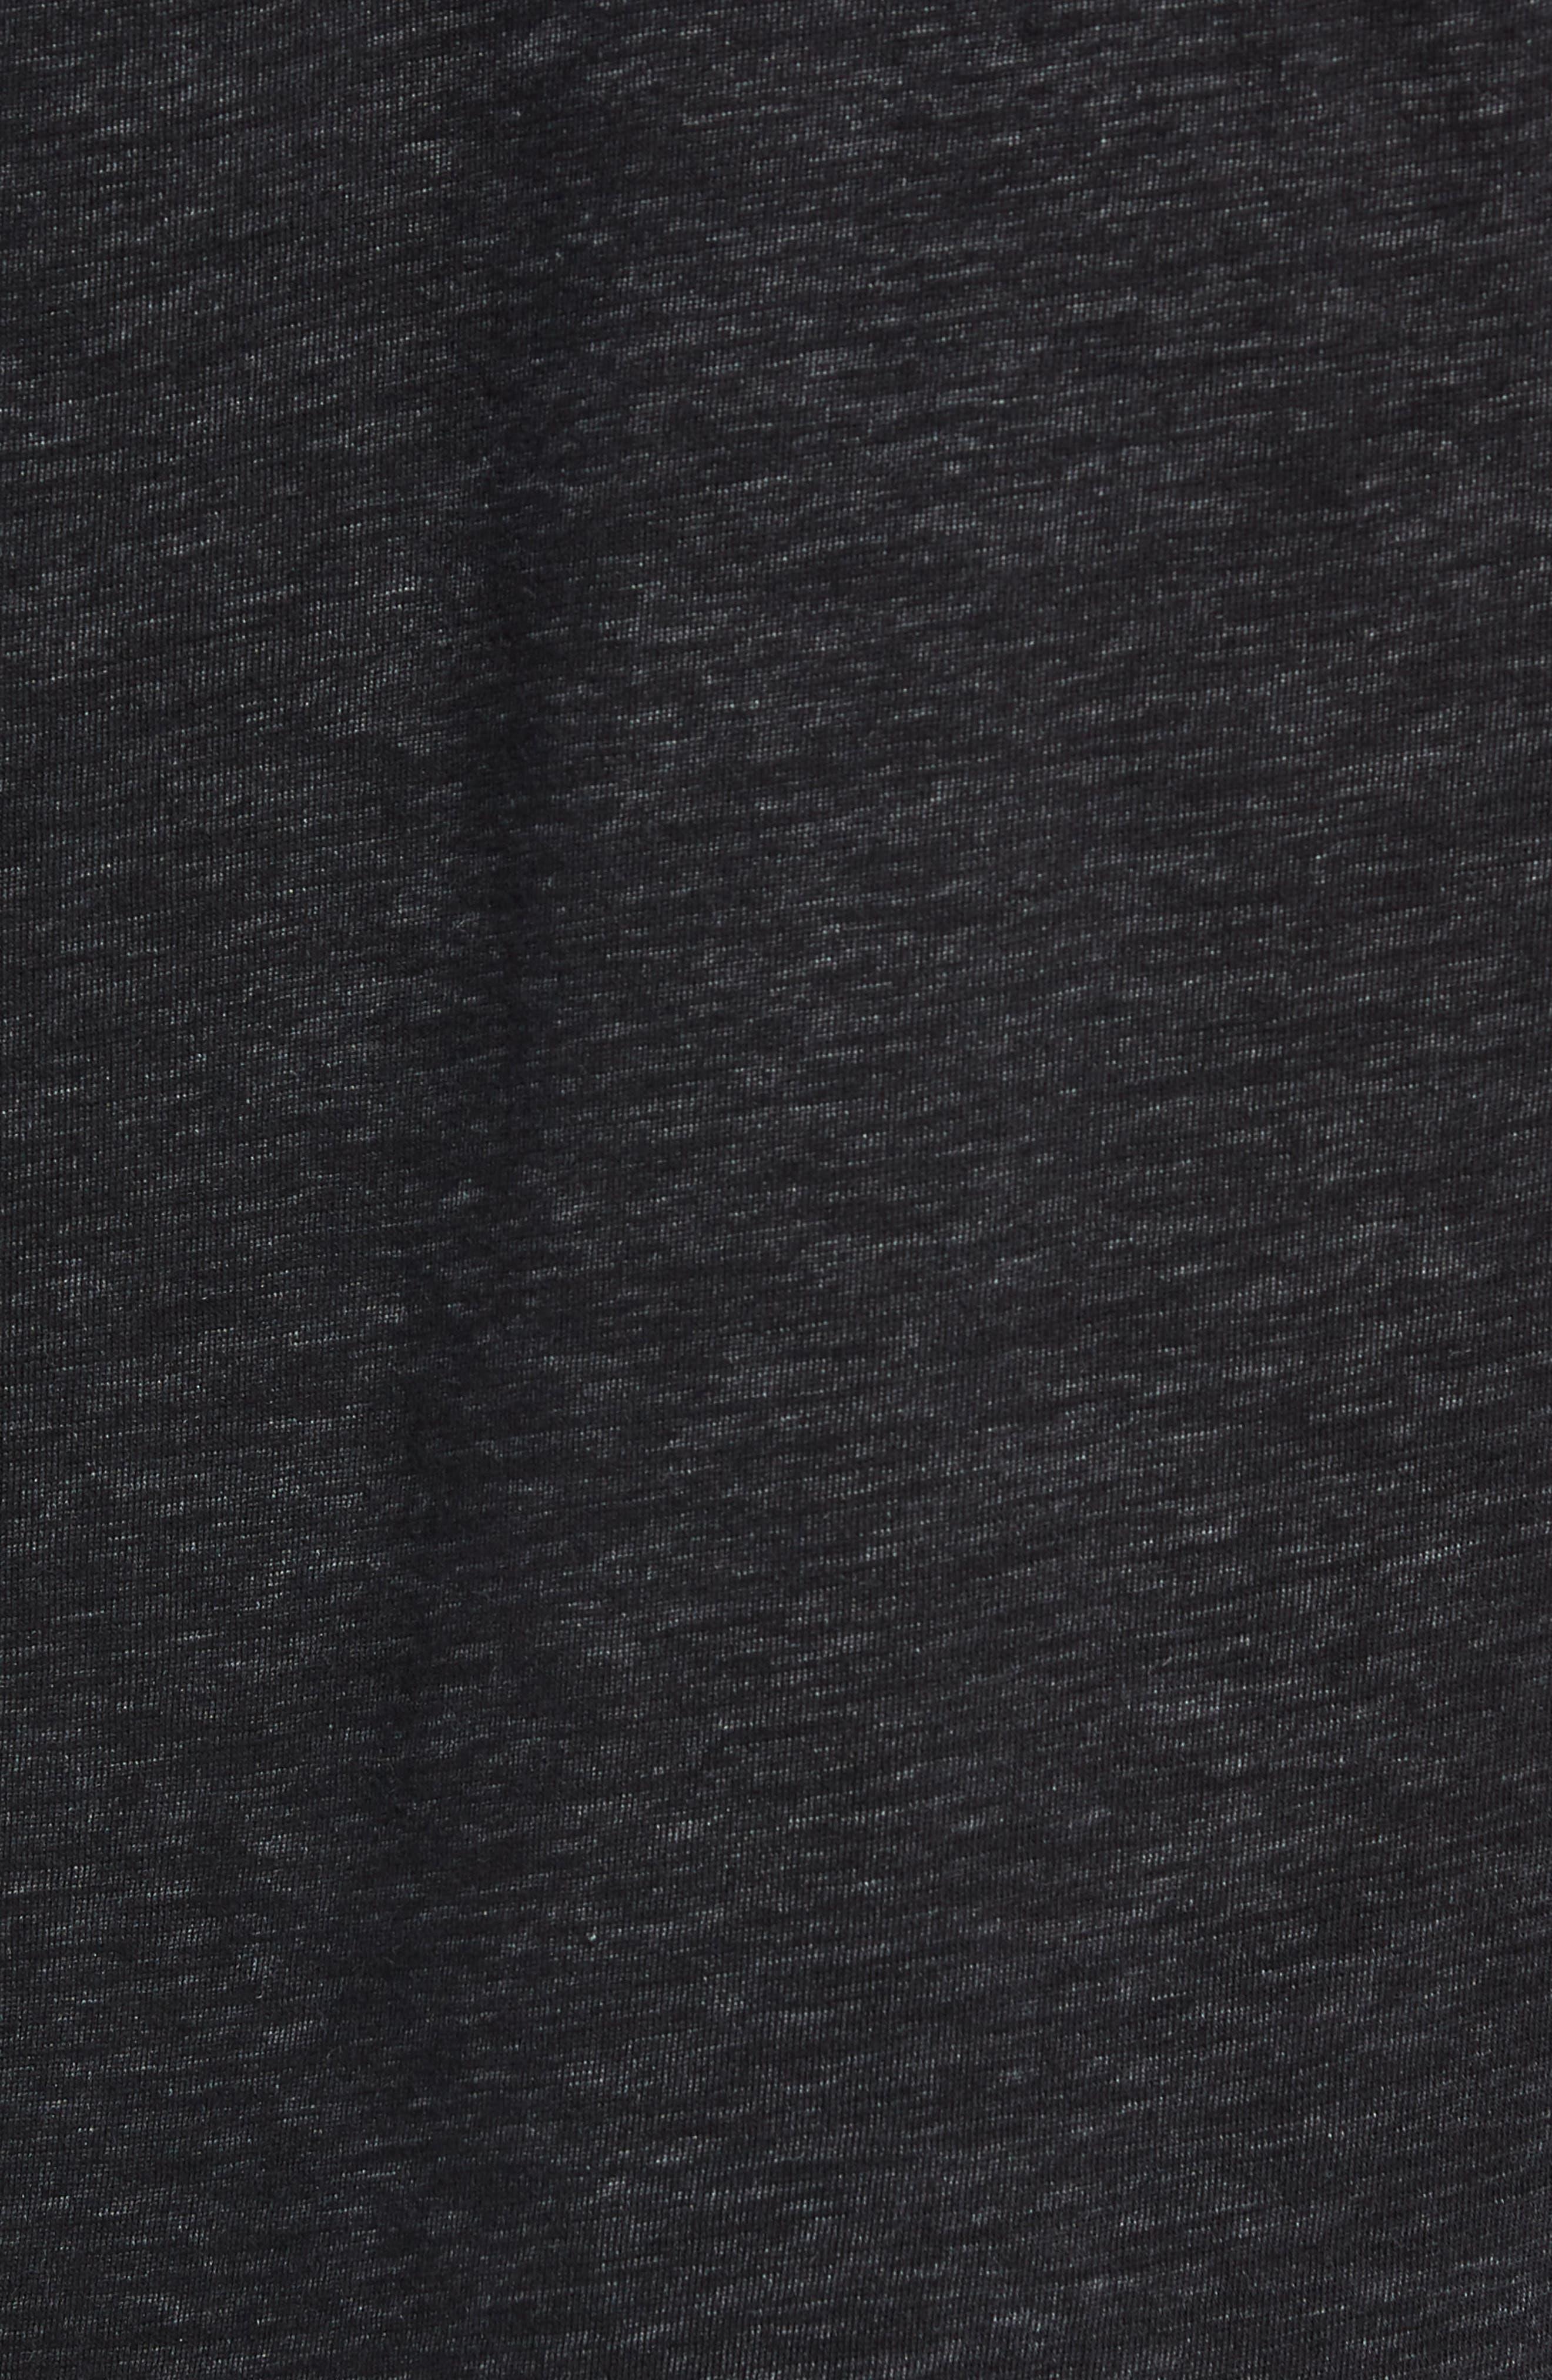 Lagos Dry Hoodie,                             Alternate thumbnail 5, color,                             010